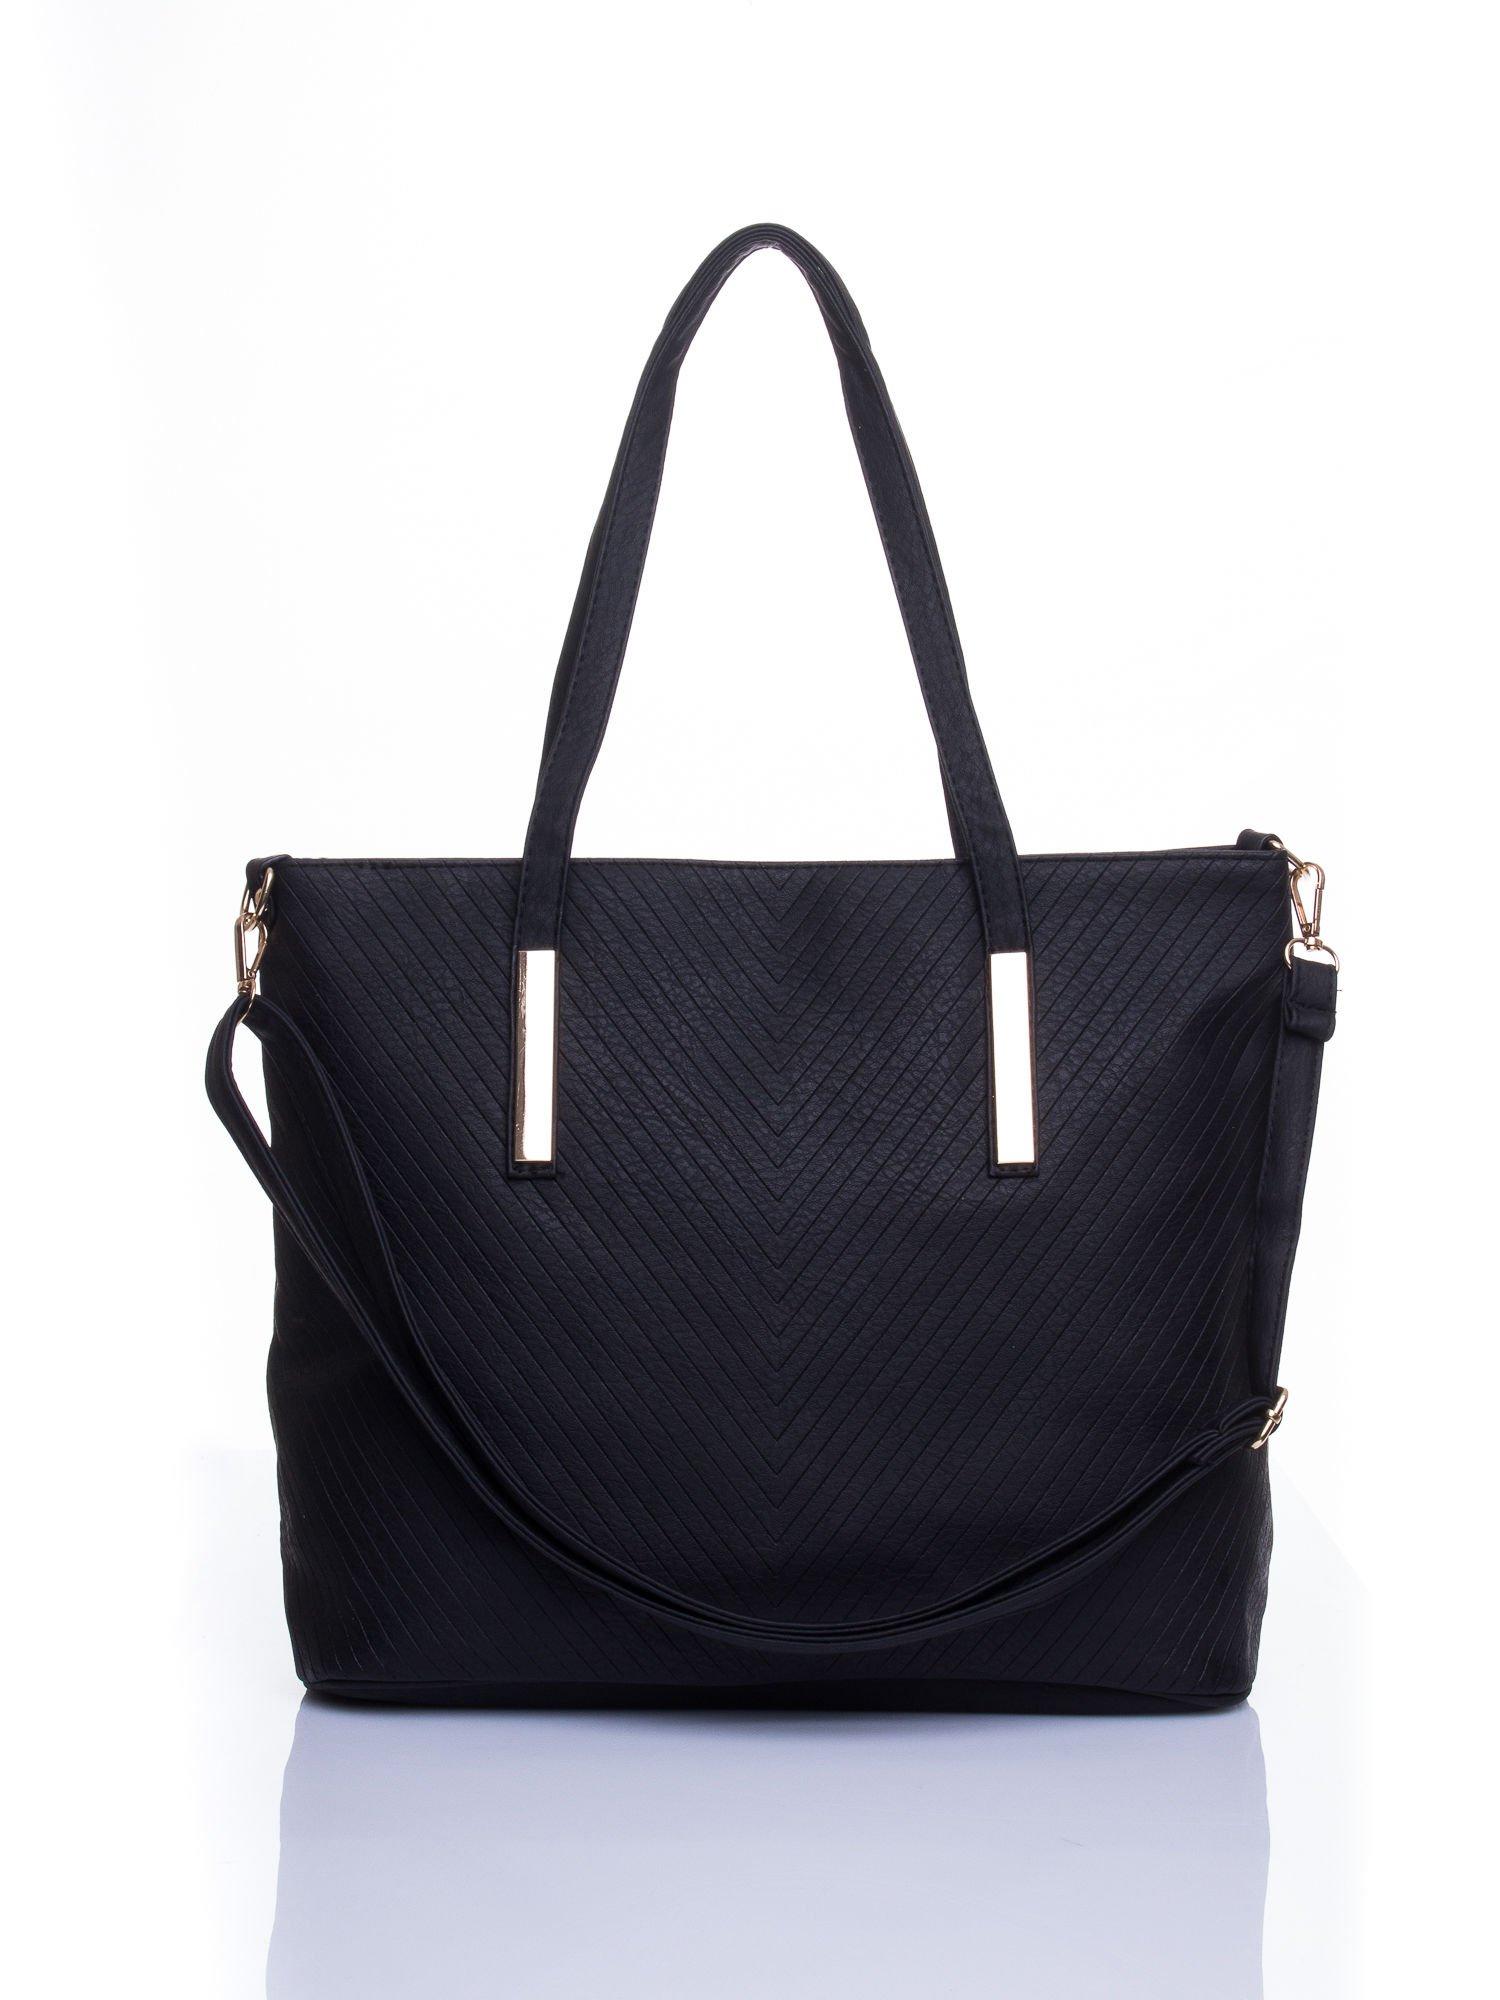 Czarna fakturowana torba shopper bag                                  zdj.                                  1